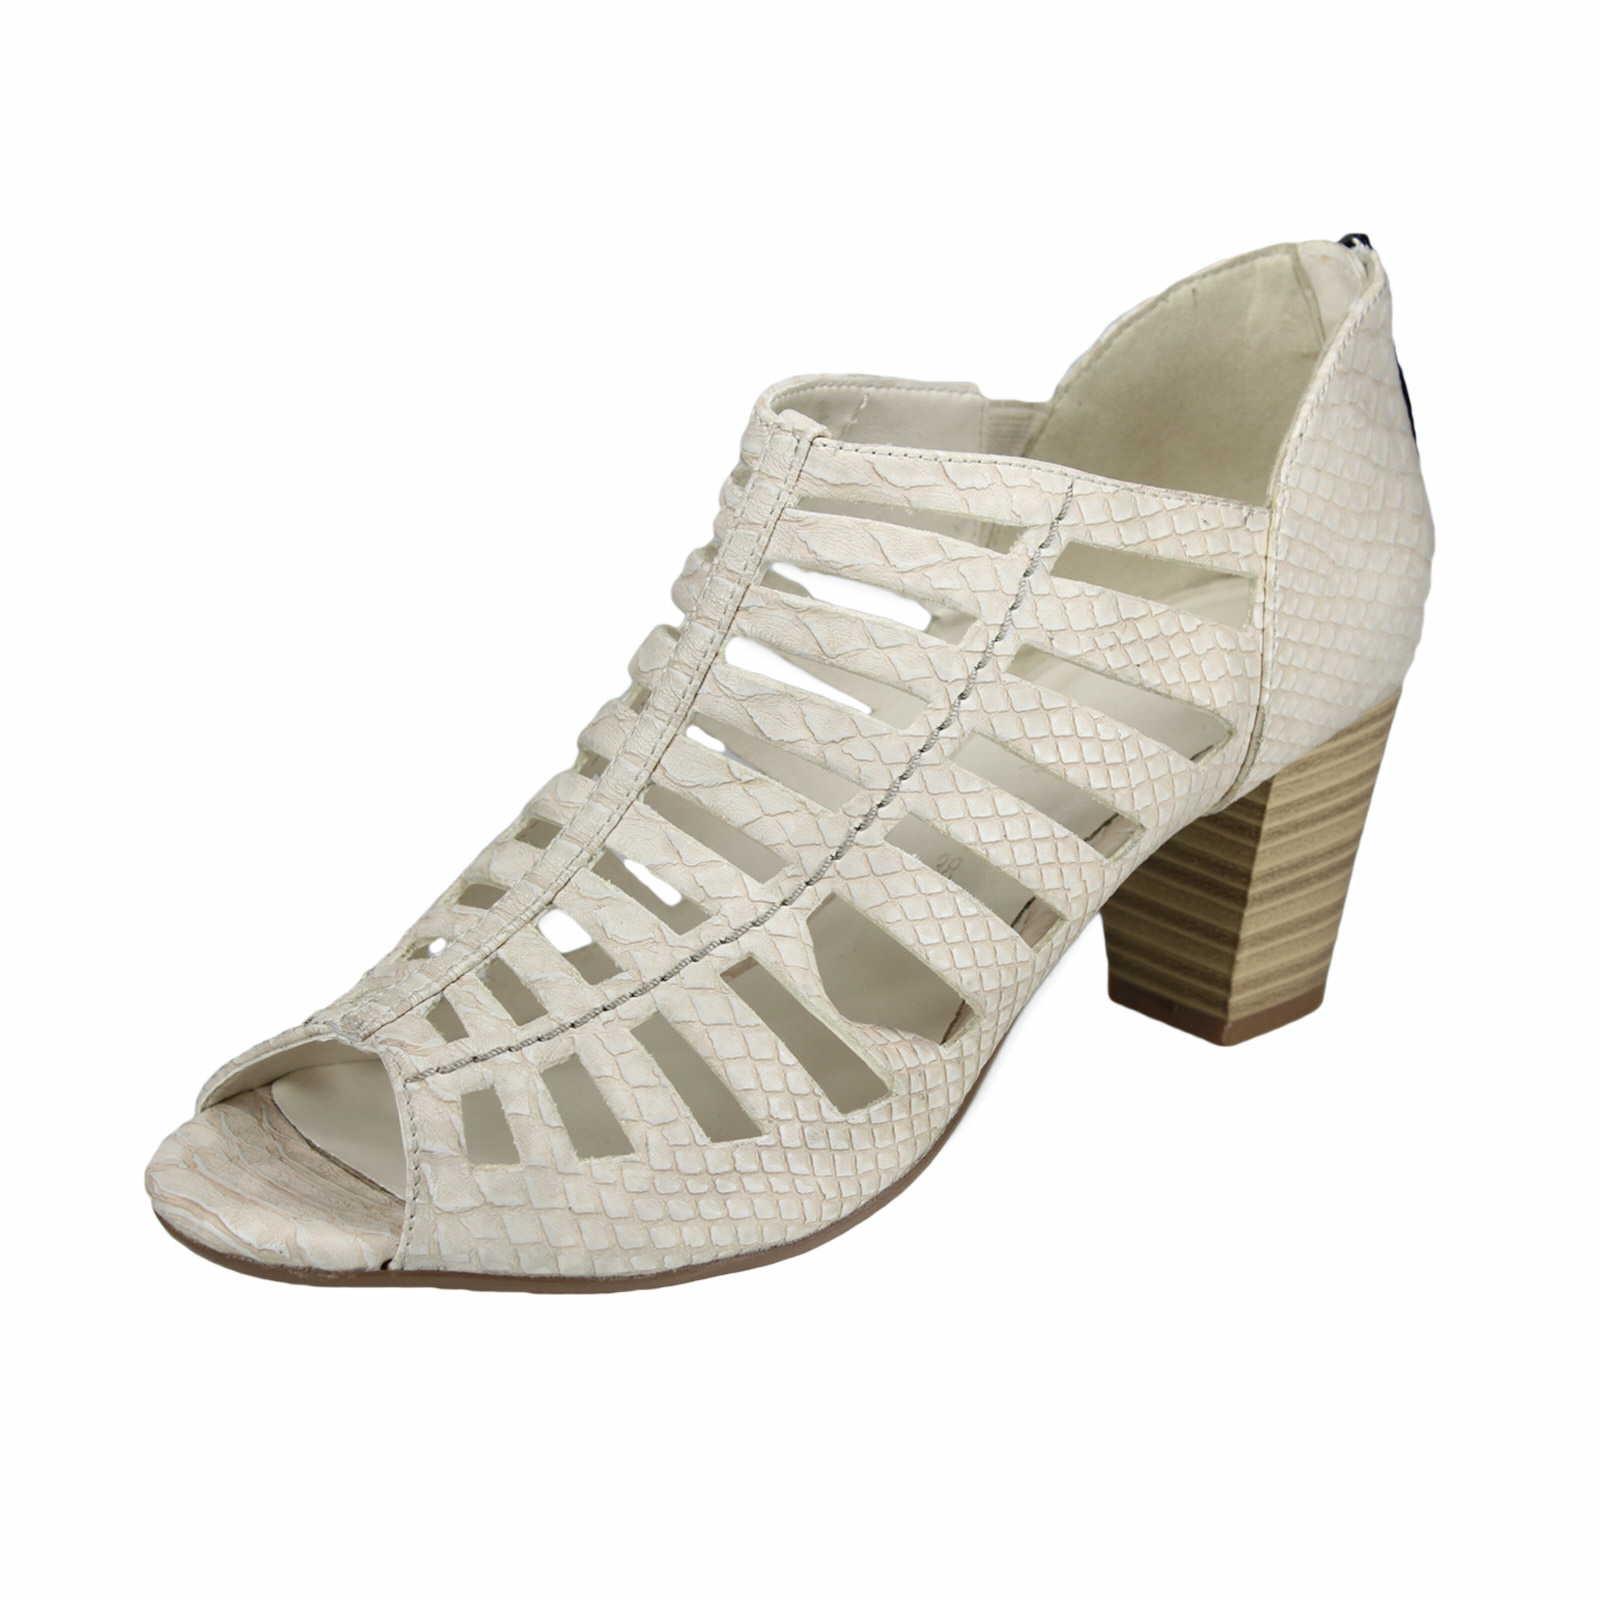 gerry weber shoes beige lotta 05 g13005 830 200 schuhparadies online shop schuhe einfach. Black Bedroom Furniture Sets. Home Design Ideas